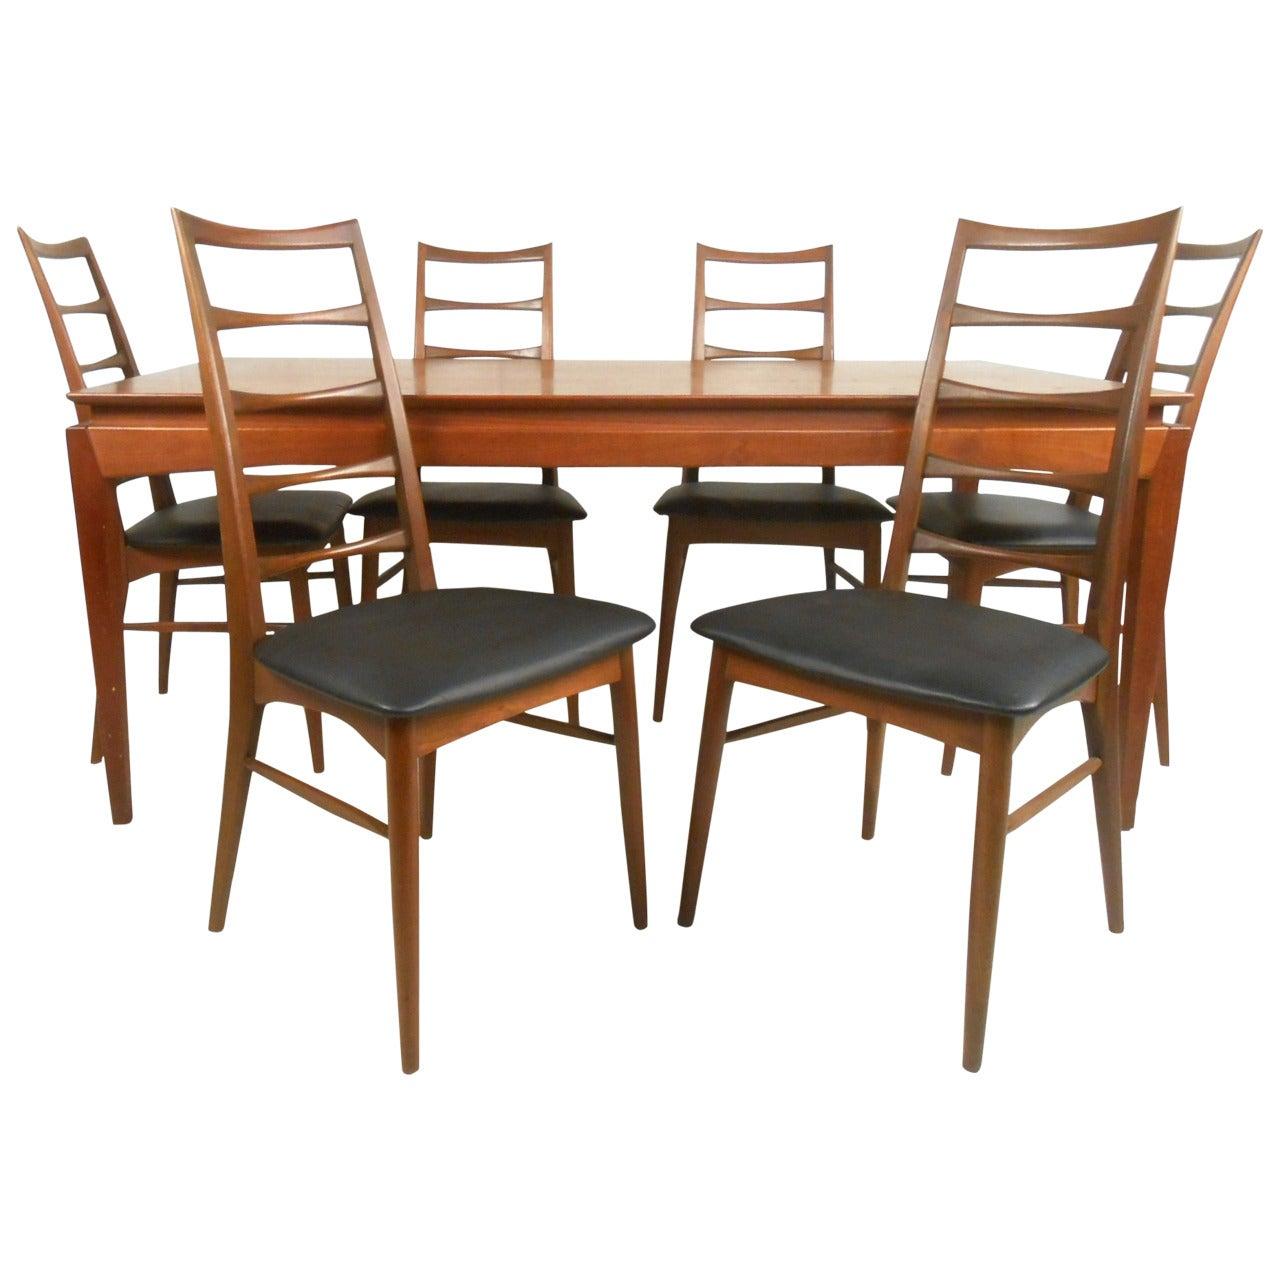 Niels Kofoed Dining Room Set for Raymor